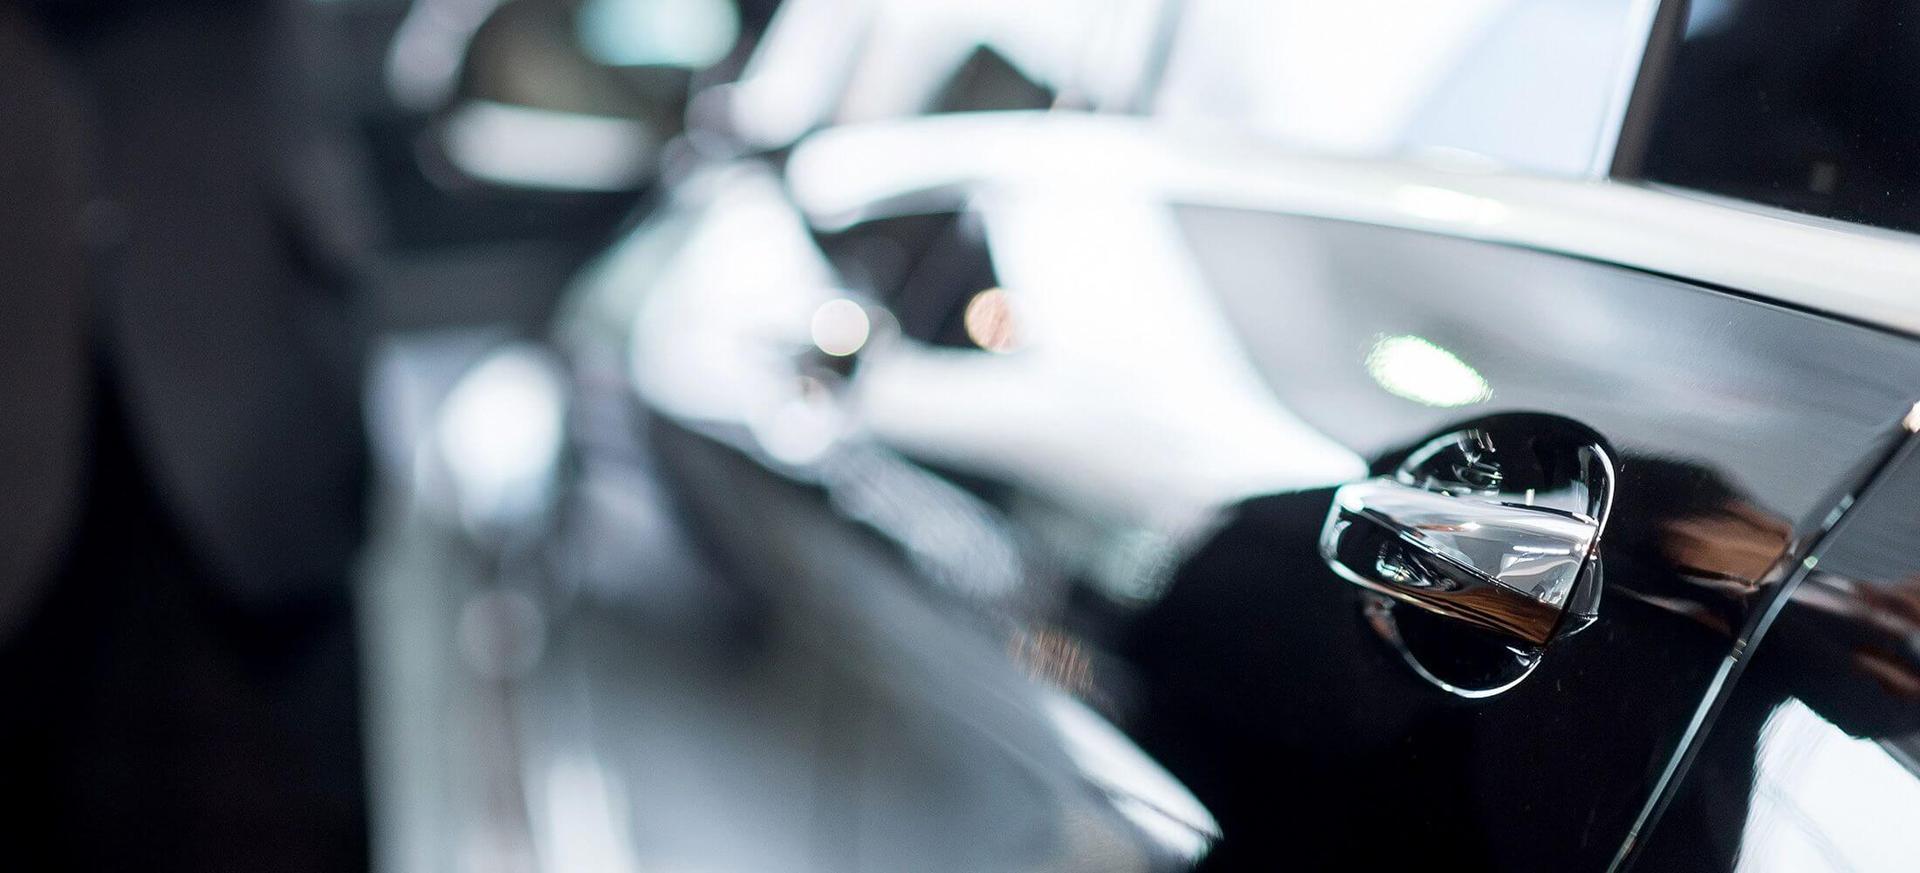 B2B-Portal. EU-Neuwagen. Unkomplizierte Kaufabwicklung. Fahrzeuglogistik Service